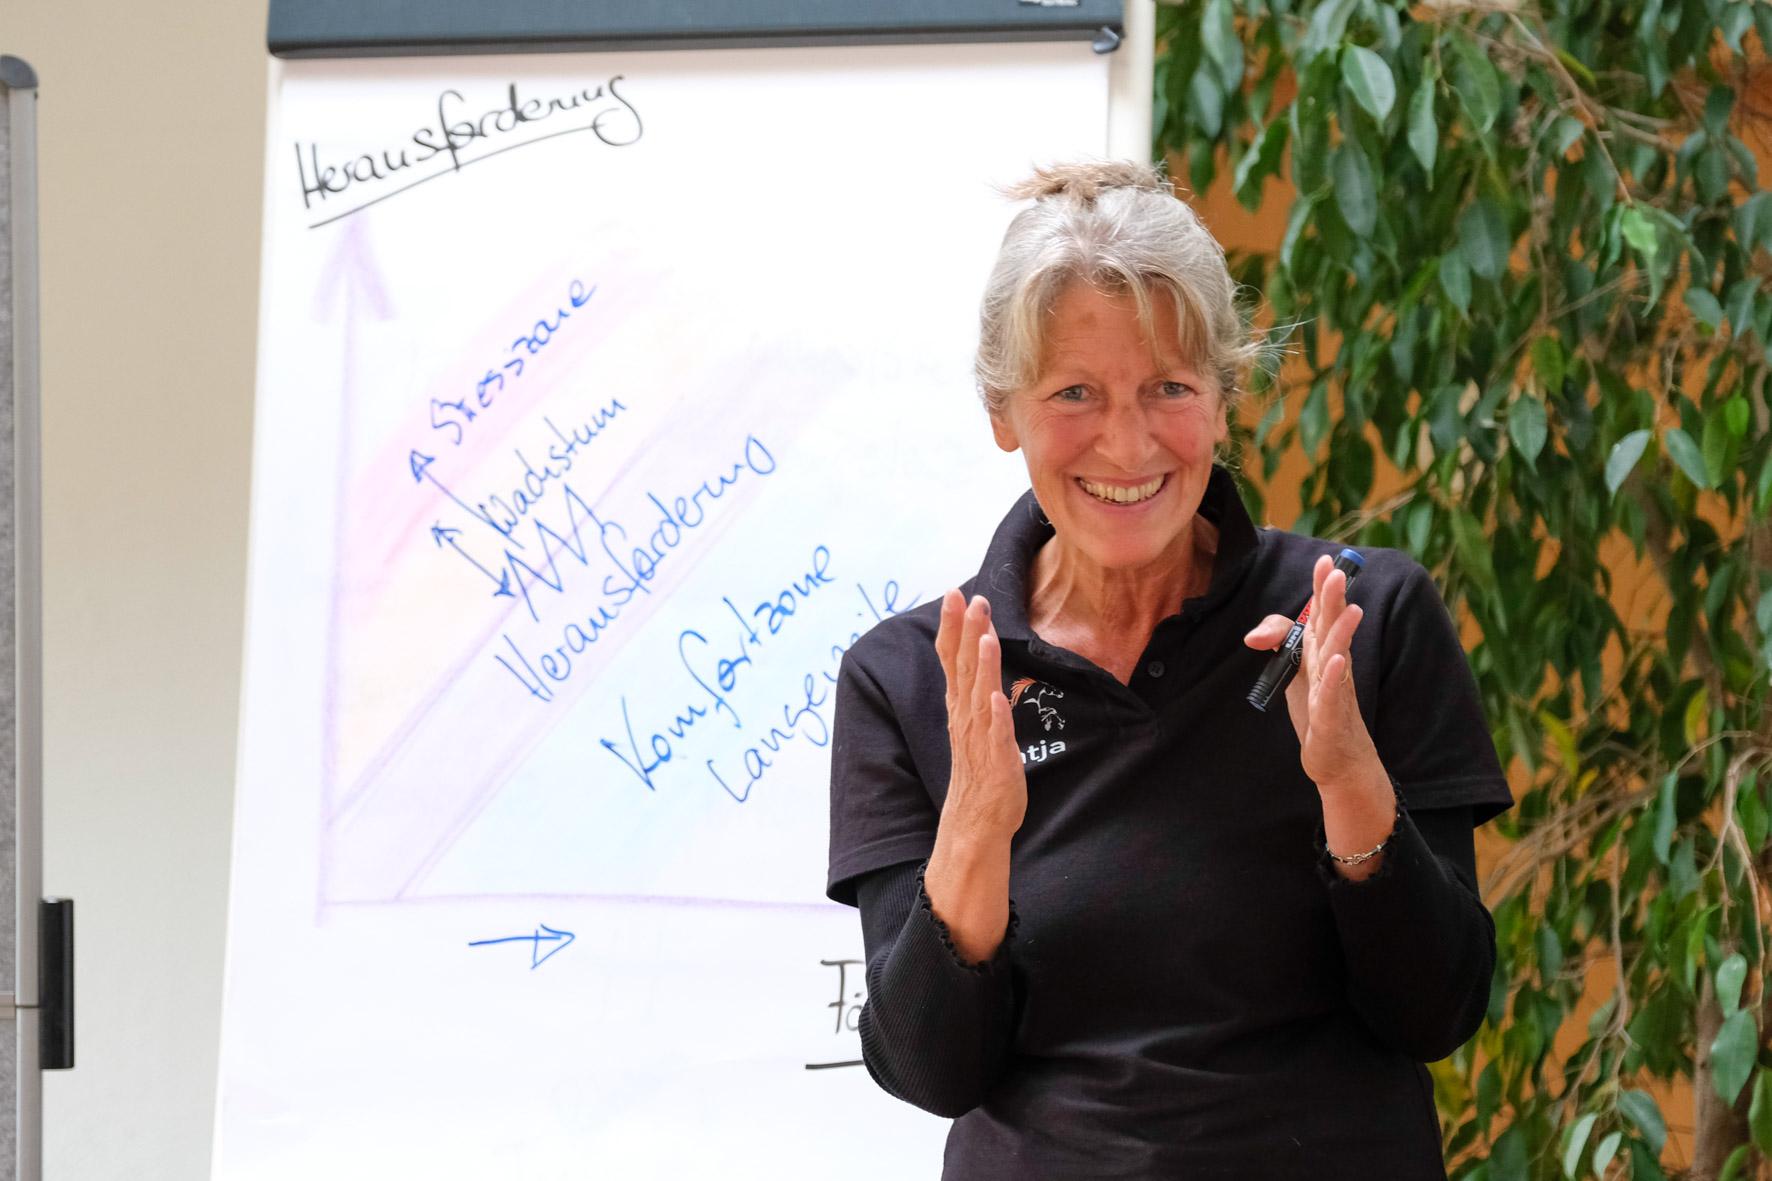 Katja Harzheim